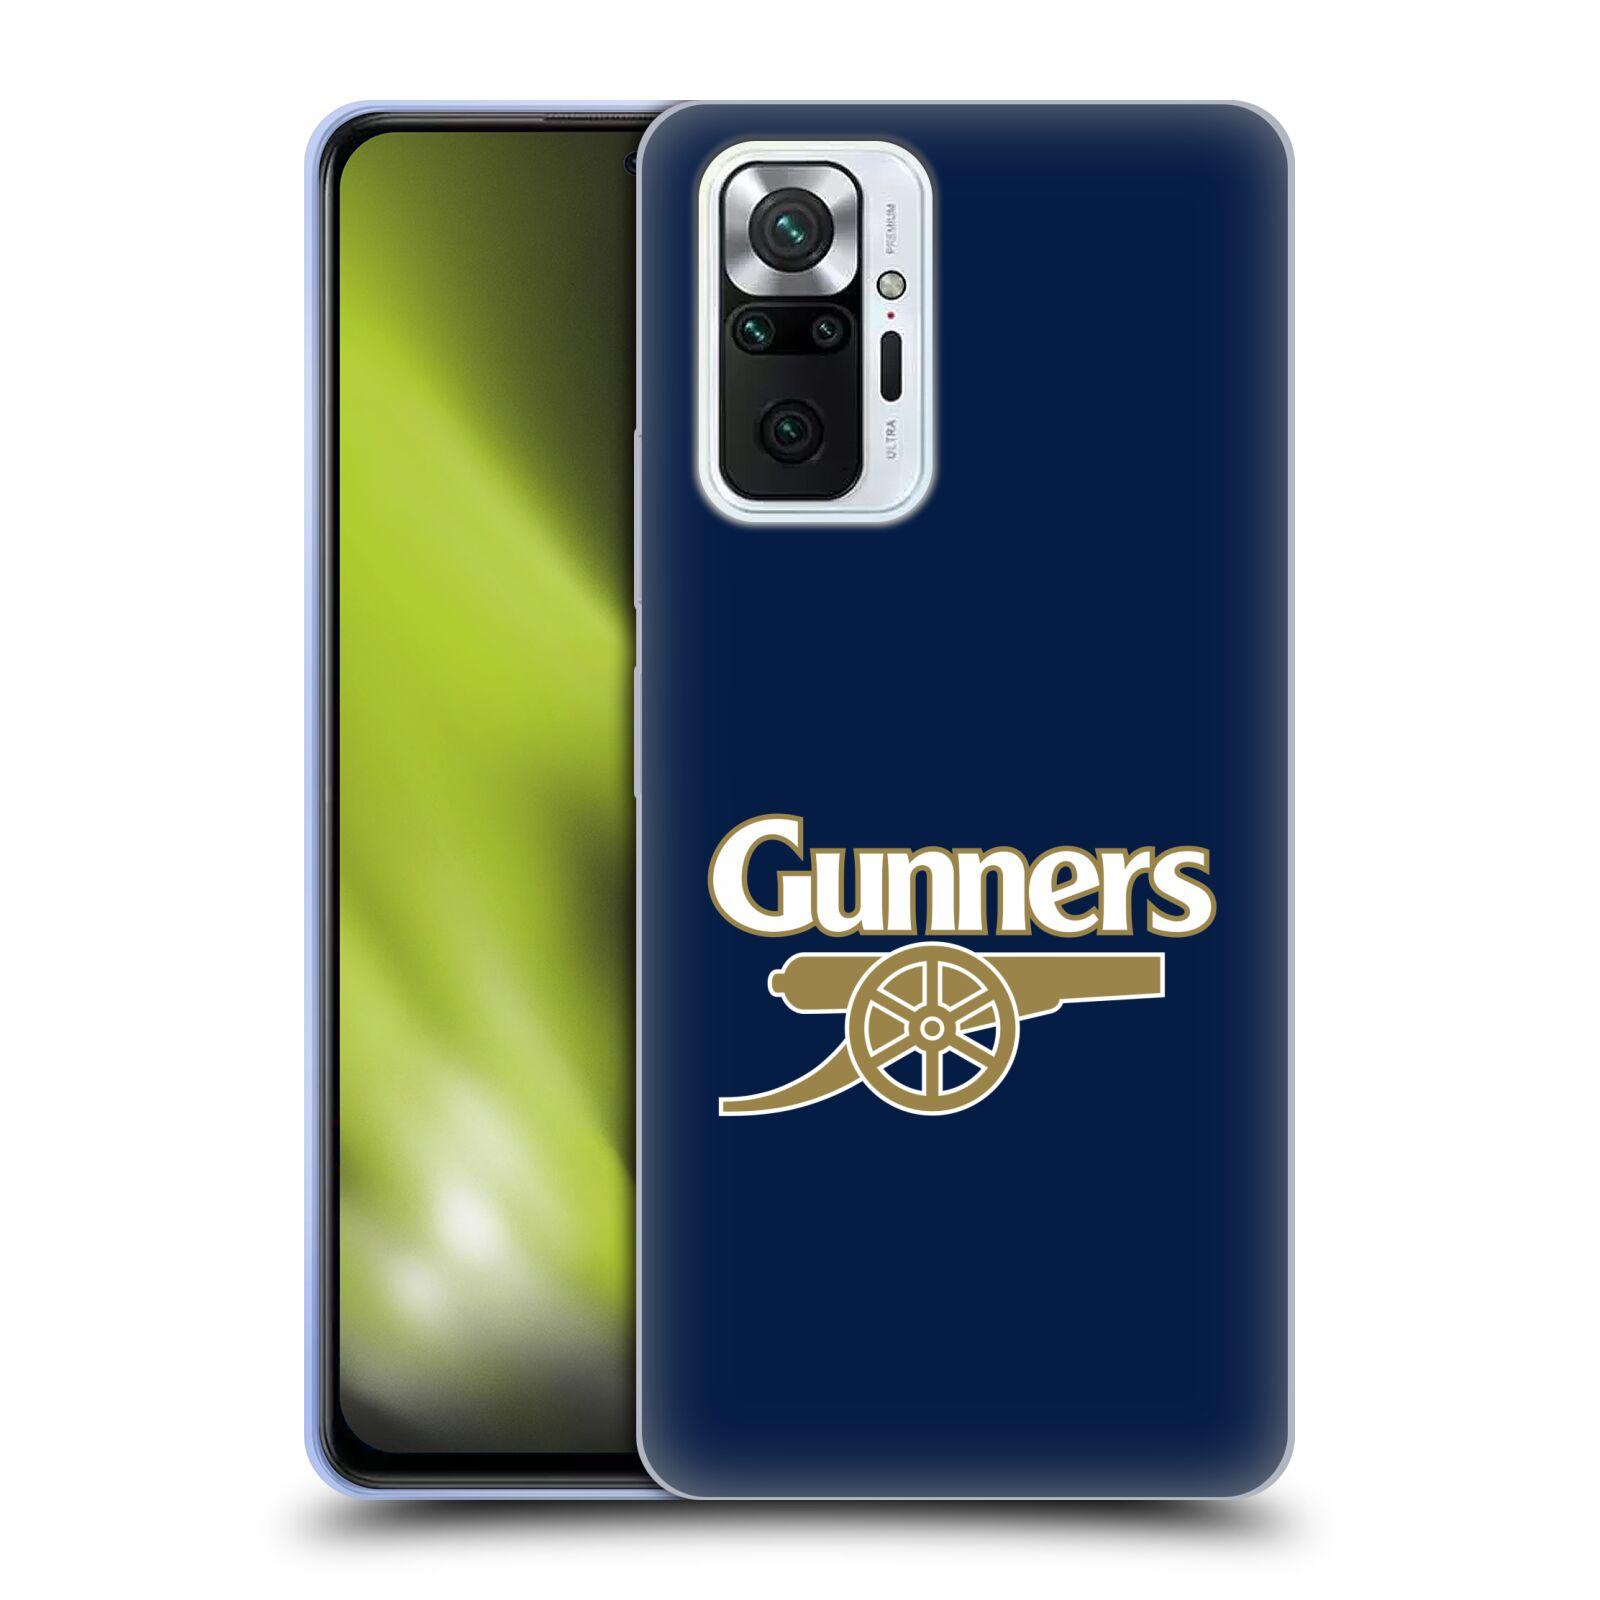 Silikonové pouzdro na mobil Xiaomi Redmi Note 10 Pro - Head Case - Arsenal FC - Gunners